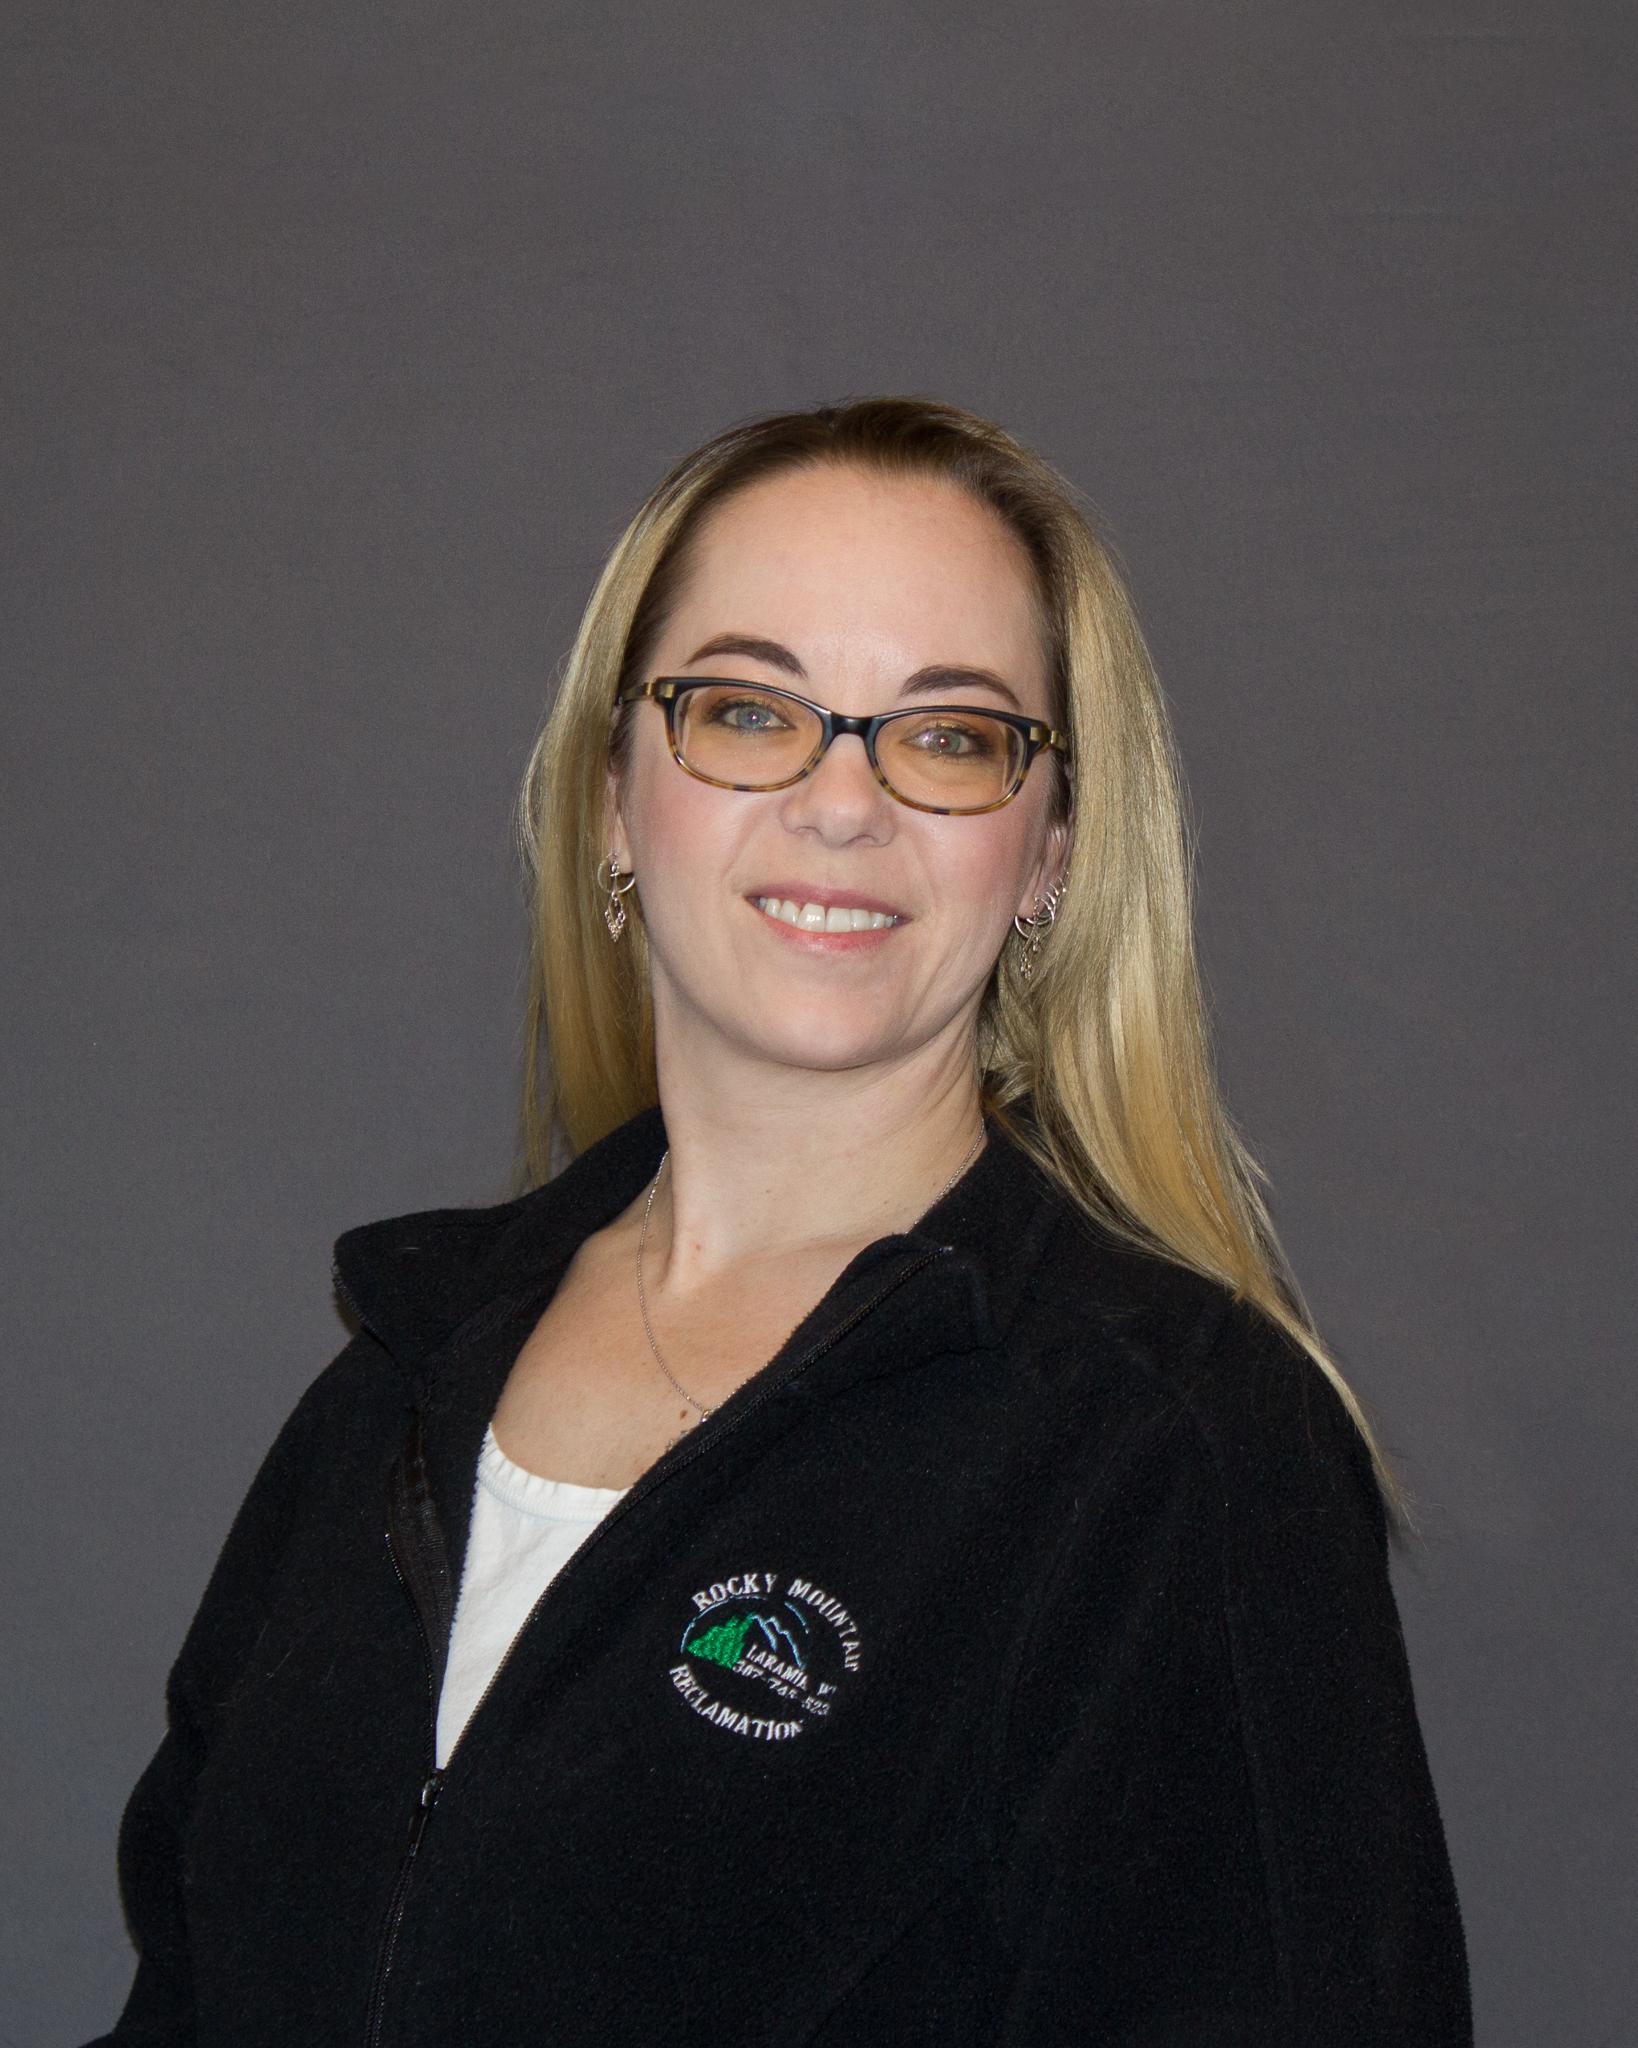 Amber Trevizo - Operations Manager